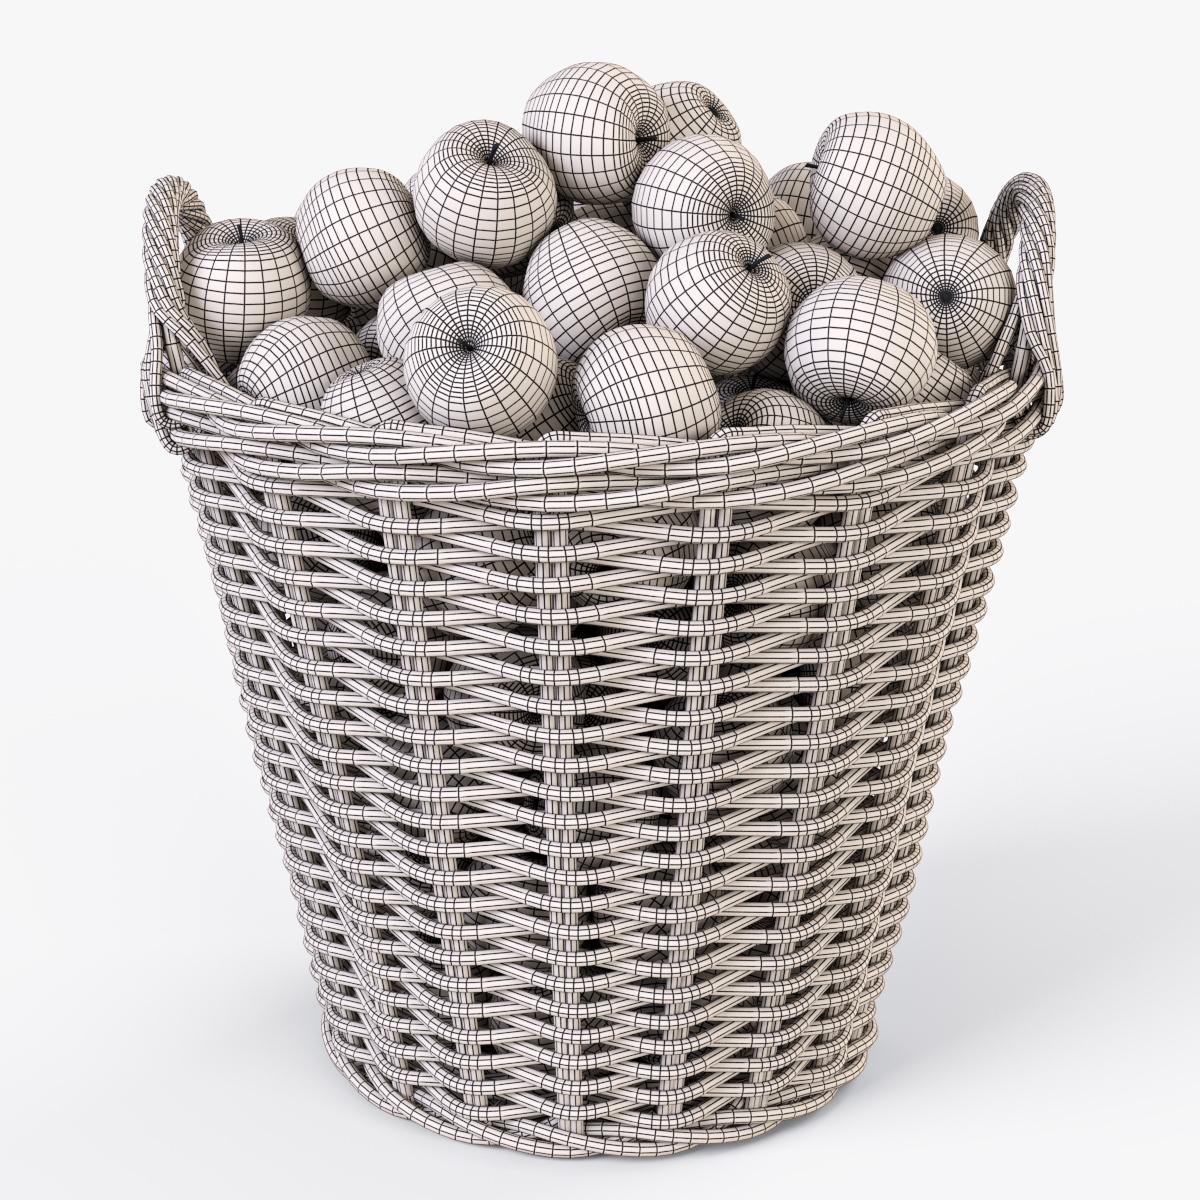 Wicker Basket Ikea Nipprig With Apples